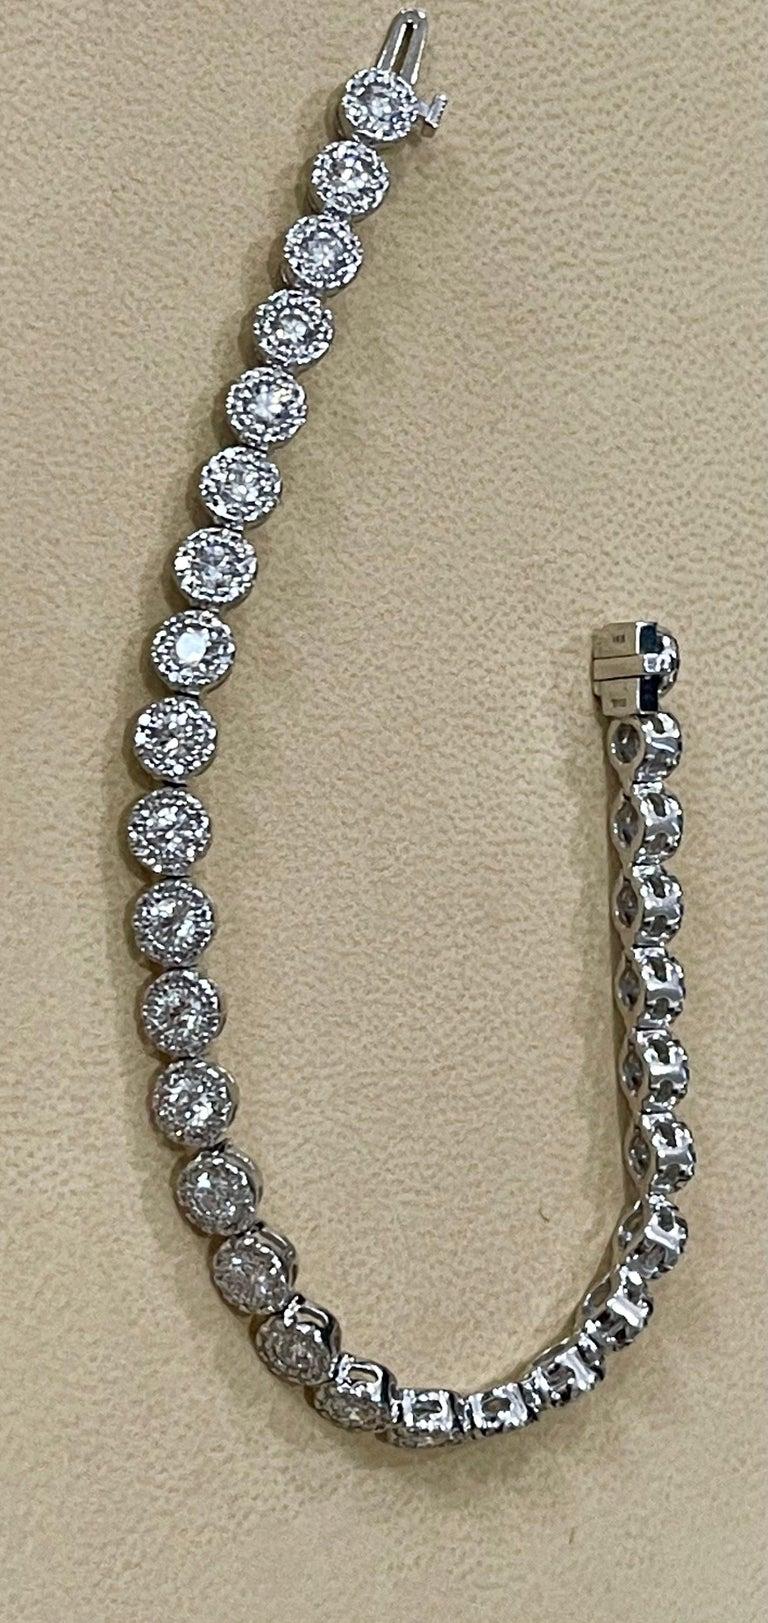 Effy's 5.5 Carat Basel Set Diamond Line Tennis Bracelet in 14 Karat White Gold For Sale 2